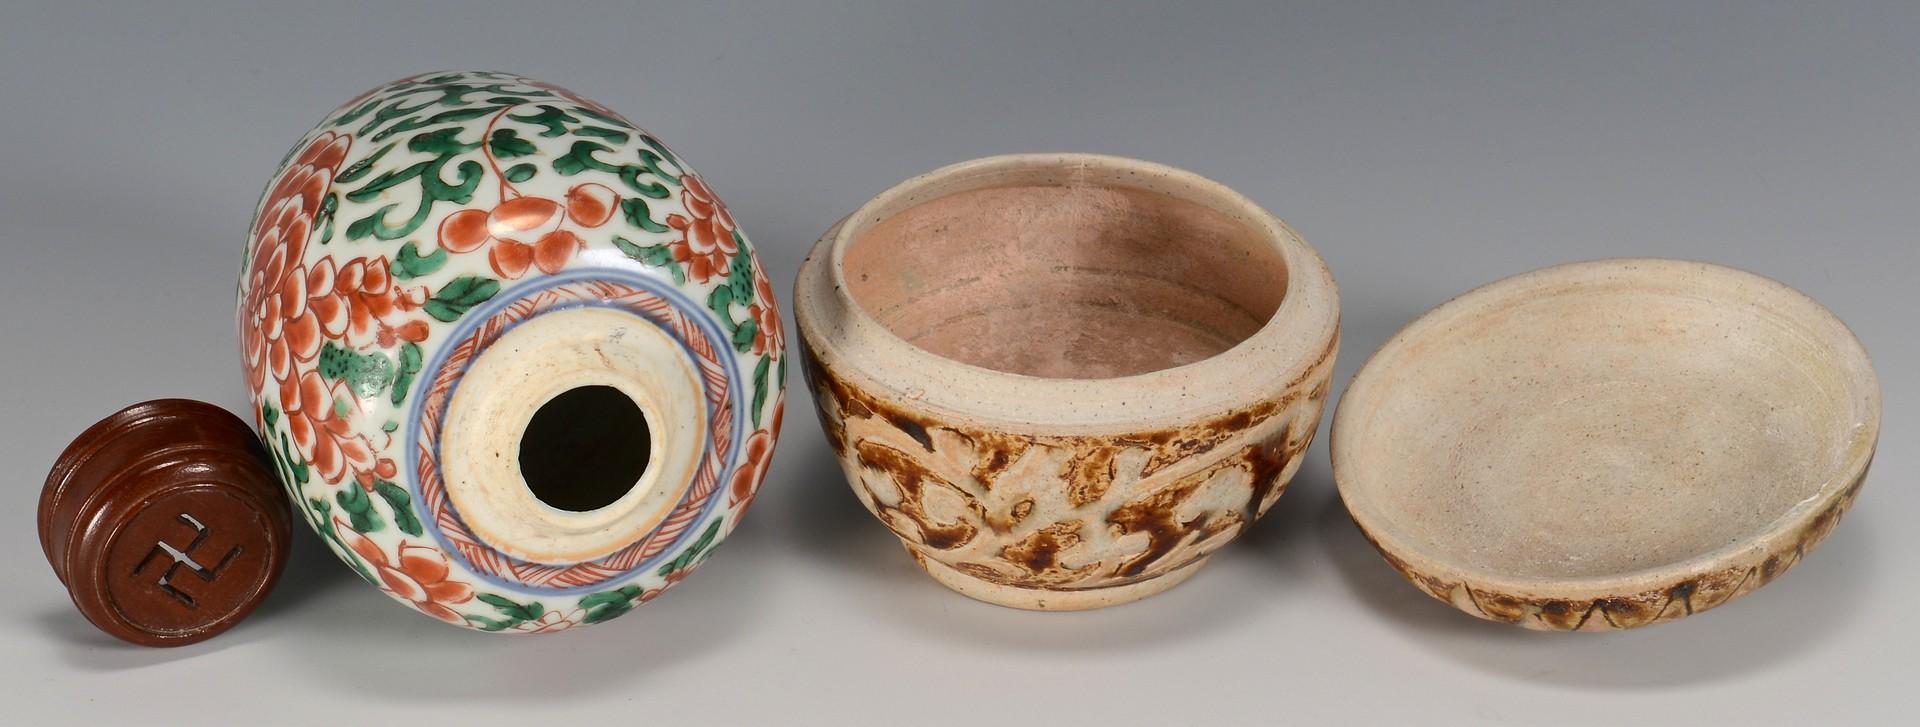 Lot 3832430: 5 Asian Decorative Items 16th-20th c.